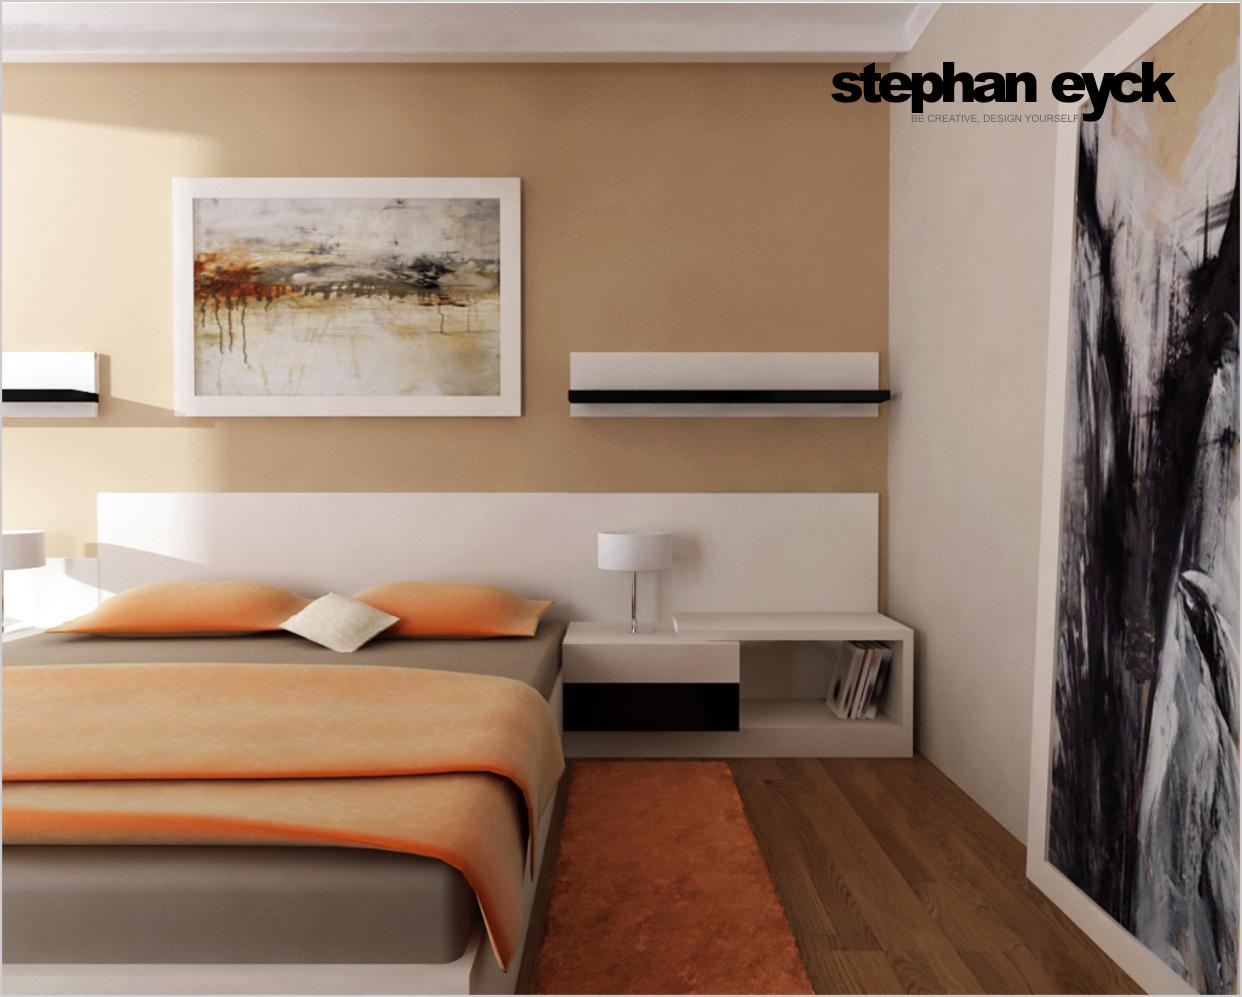 Dizain Interior | Joy Studio Design Gallery - Best Design